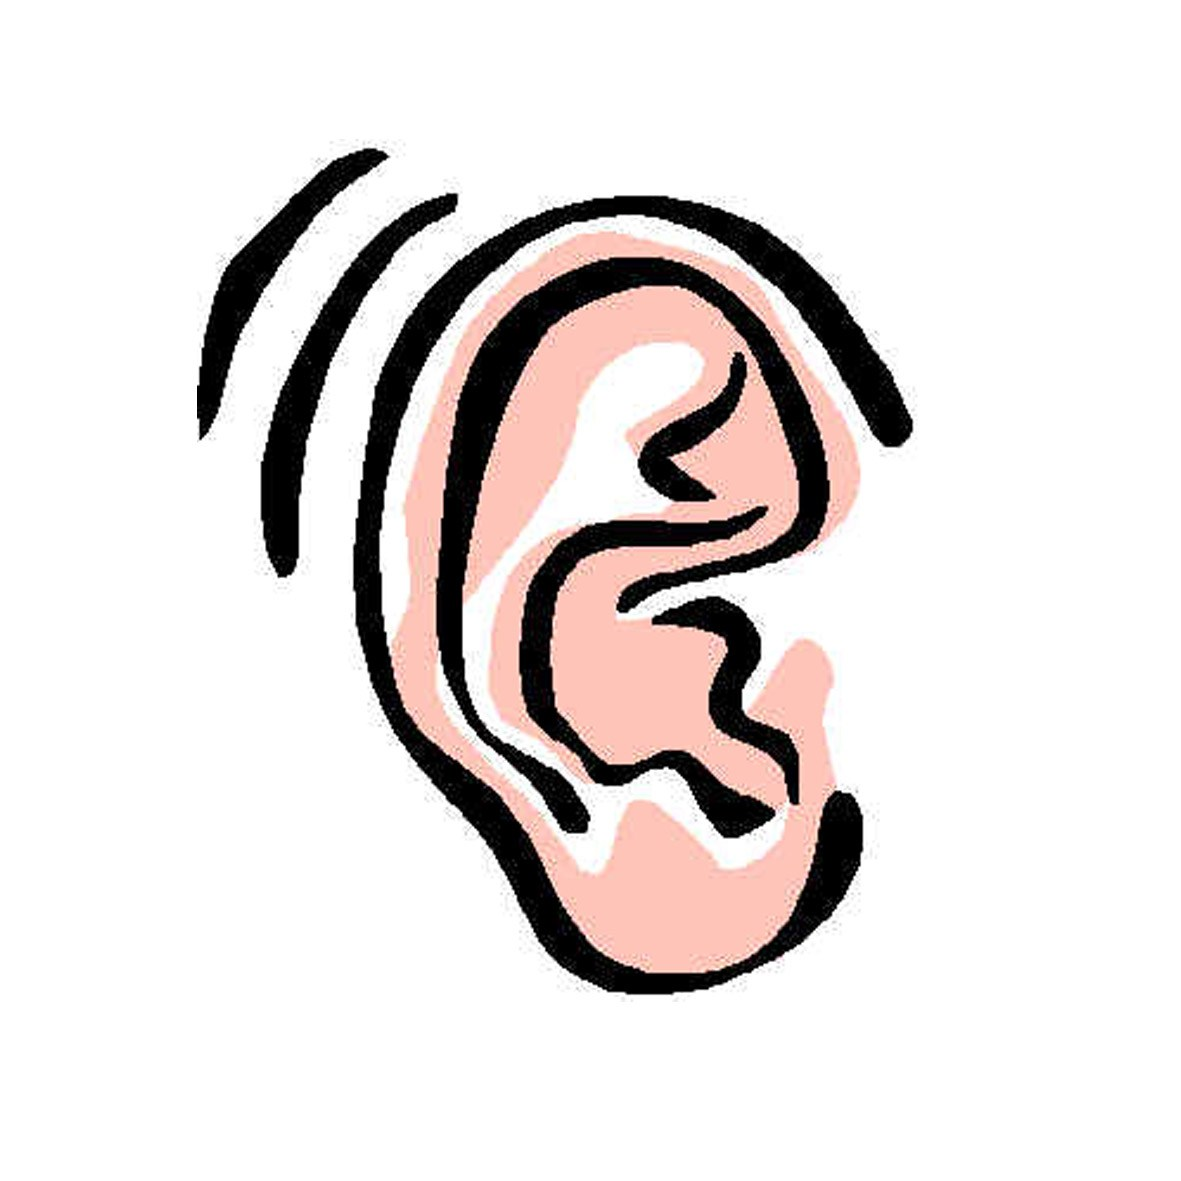 Active listening clipart 1 » Clipart Portal.